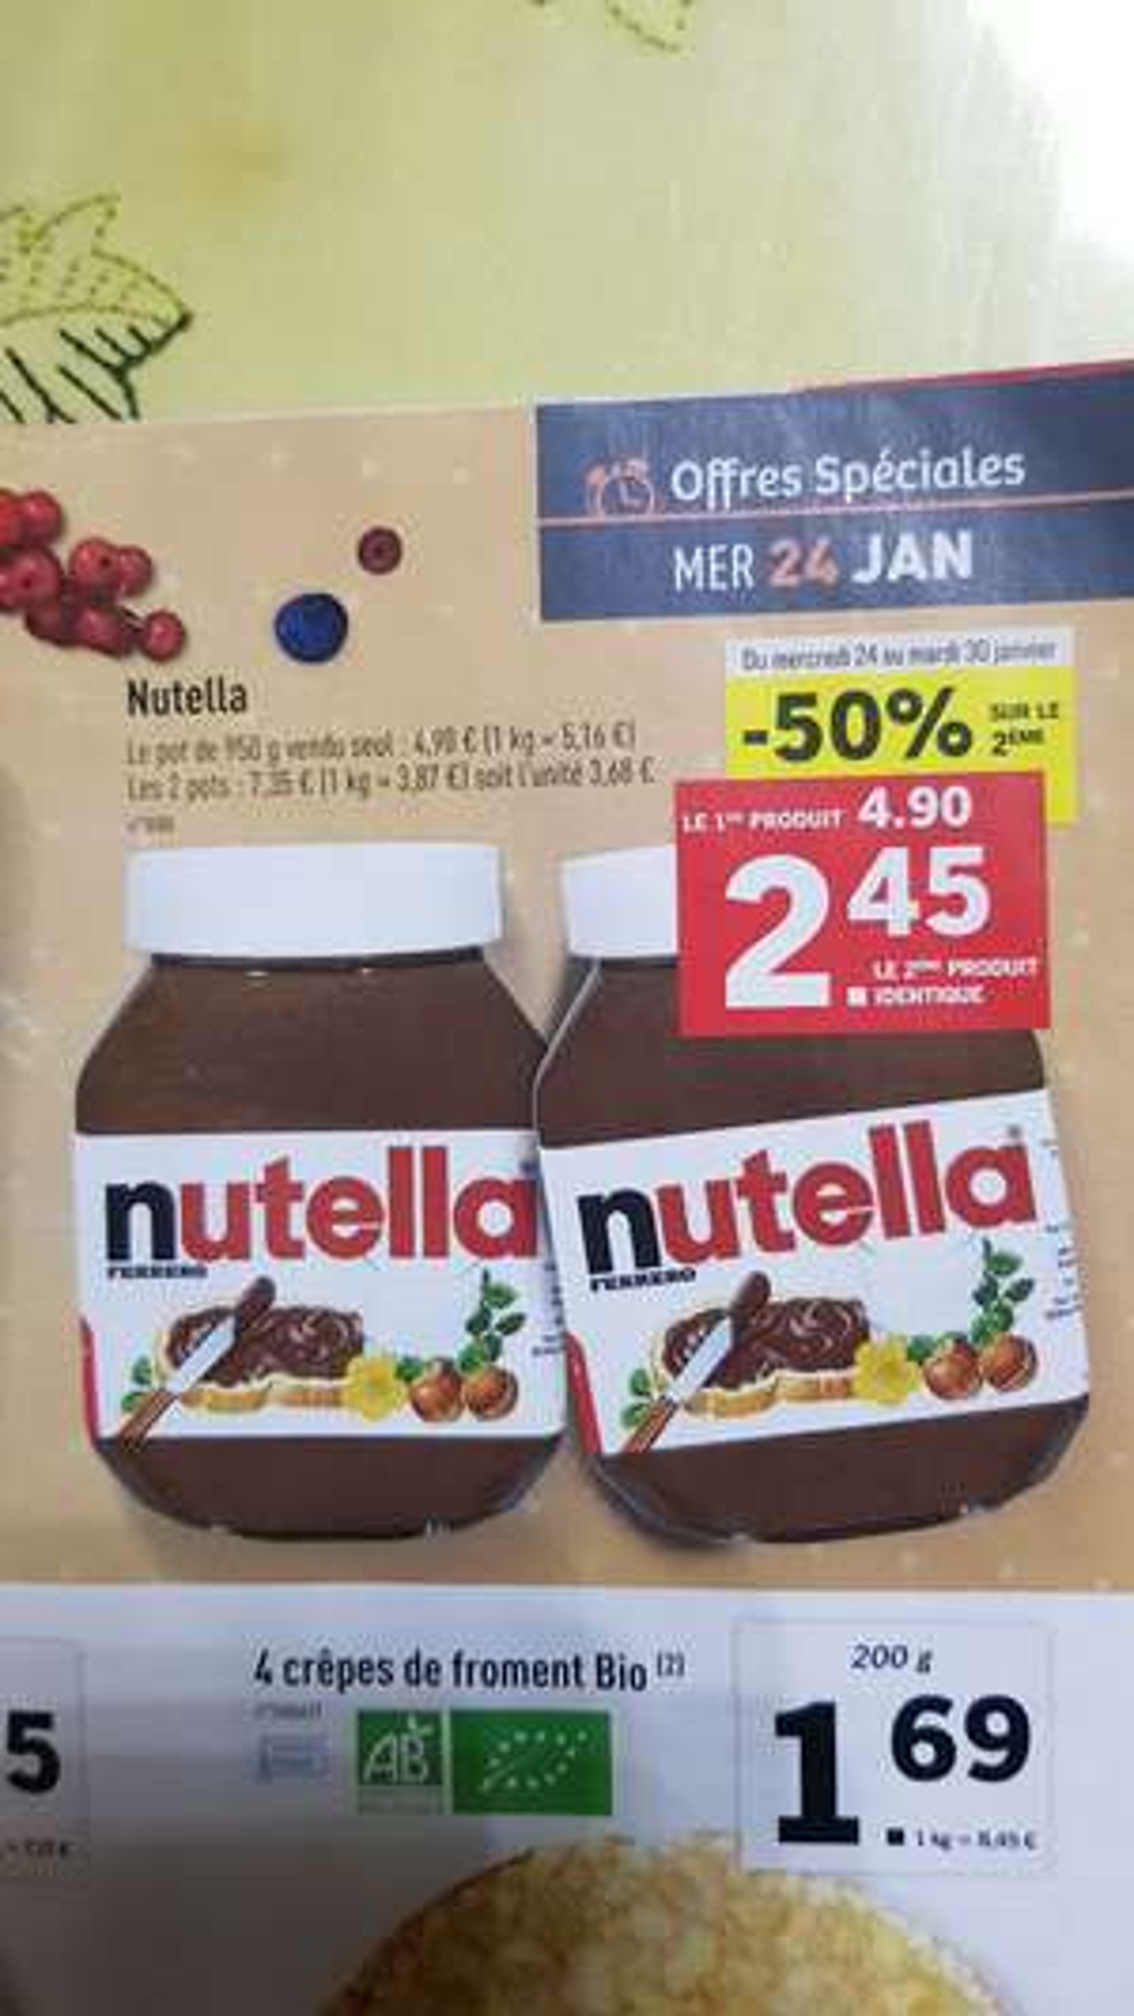 Deux pots de Nutella - 2 x 950G